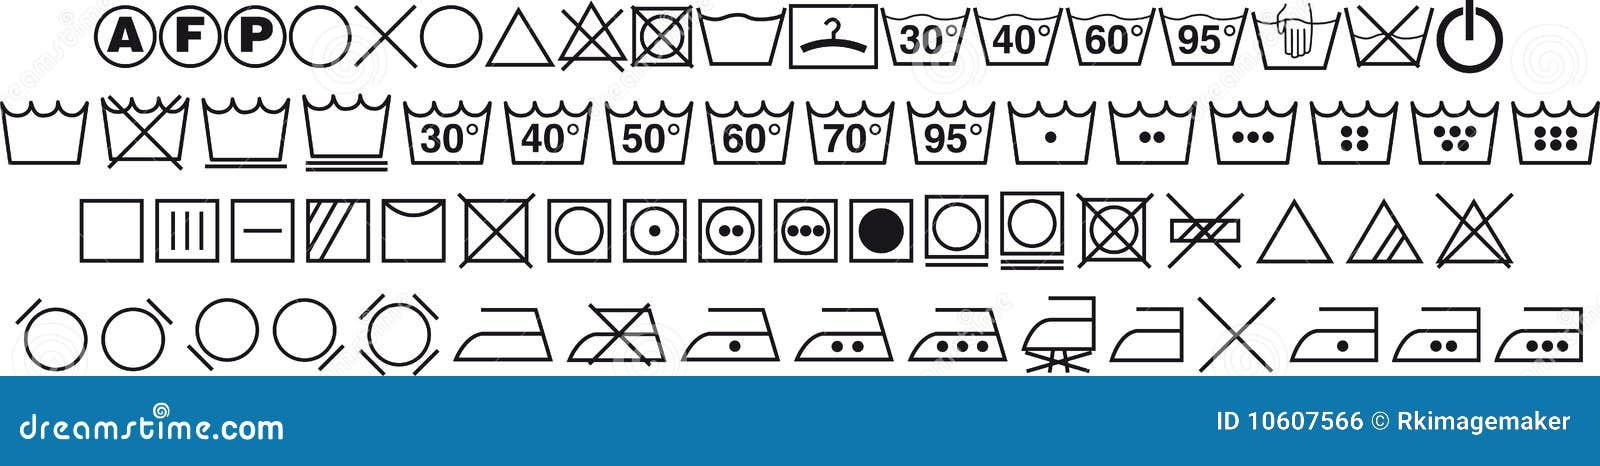 Washing Symbols Stock Vector Illustration Of Iron Dryer 10607566